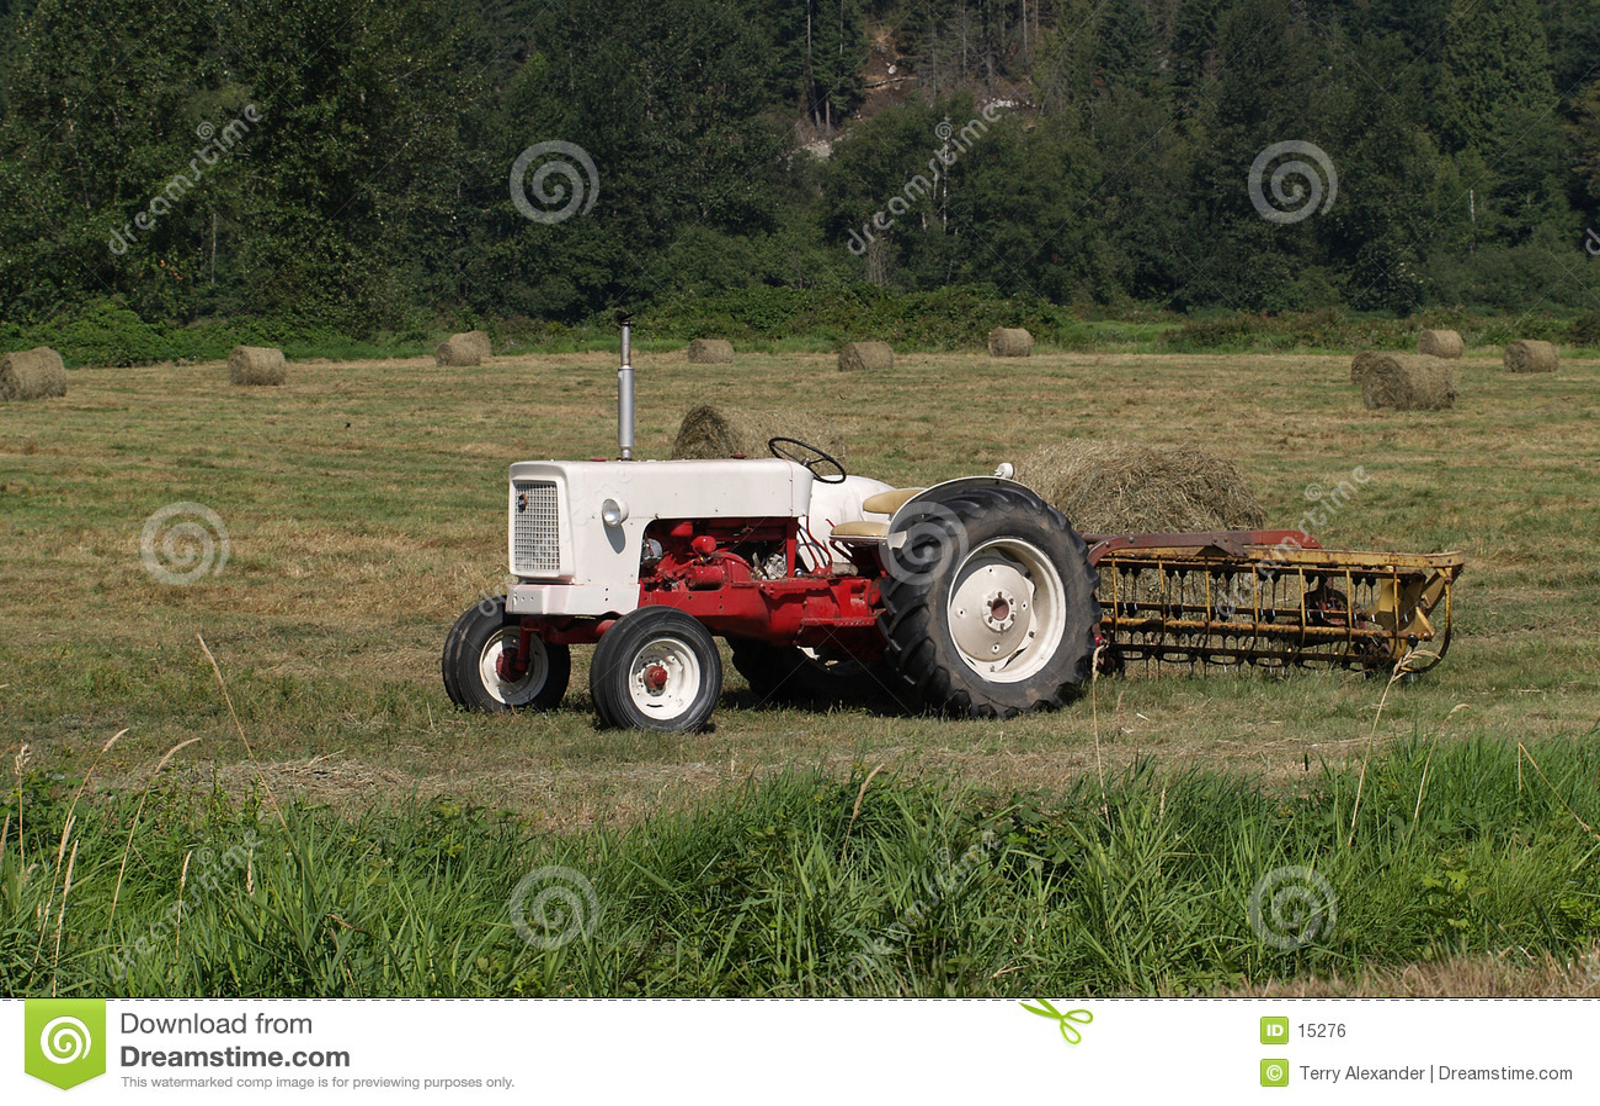 Traktor auf dem Heugebiet